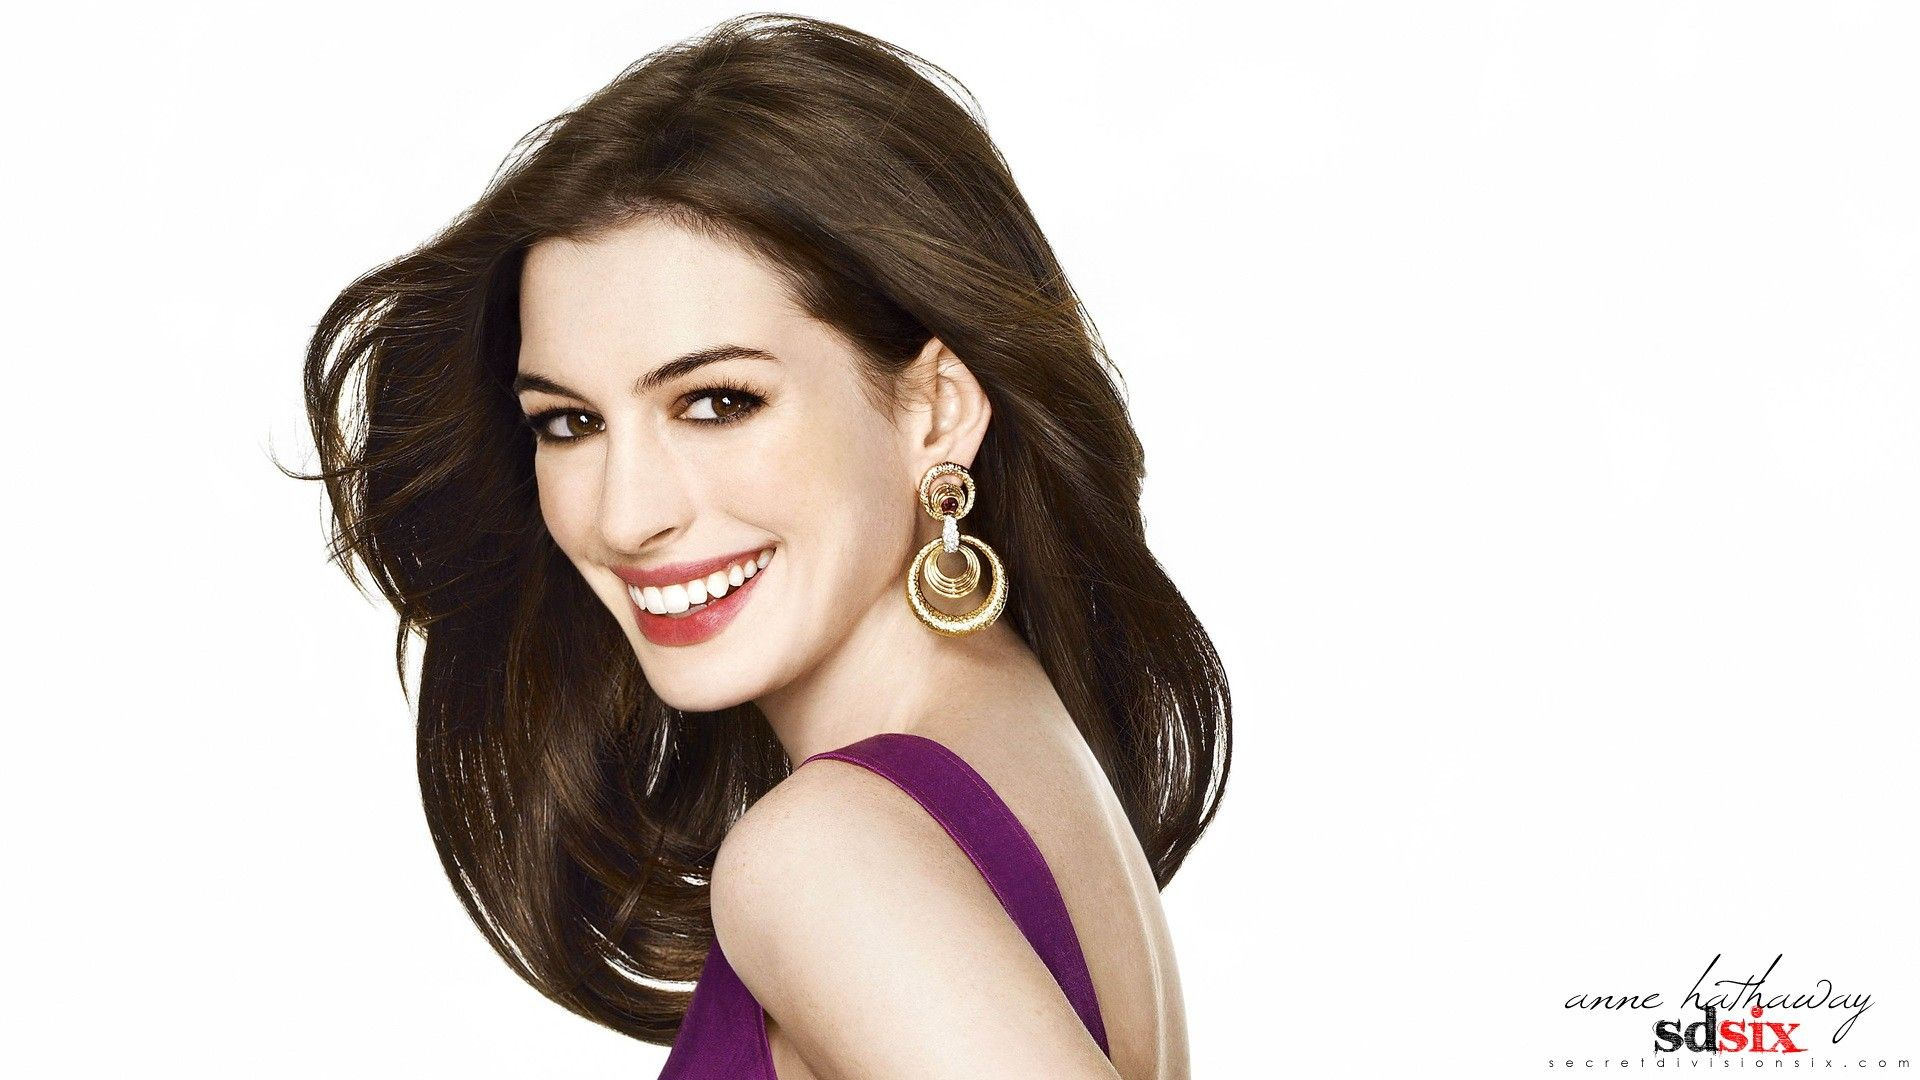 Anne Hathaway Just Hot Anne Hathaway Hd Wallpaper